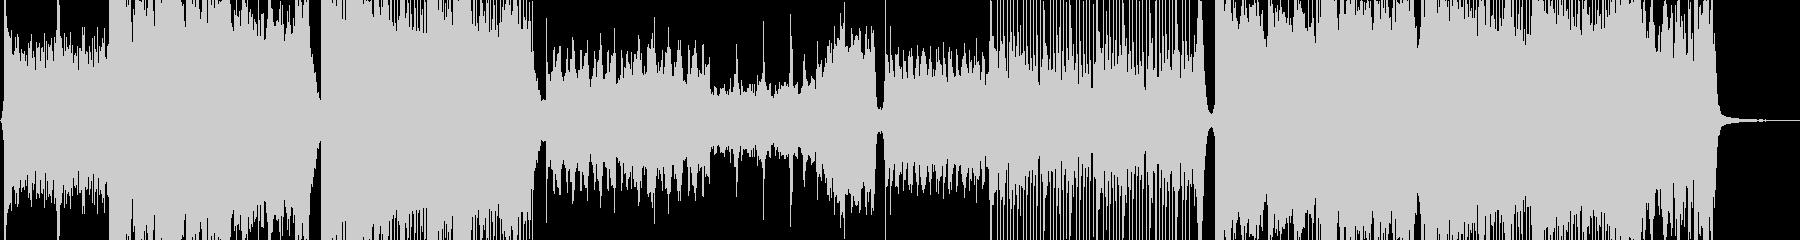 Overture-華やかなオーケストラ曲の未再生の波形